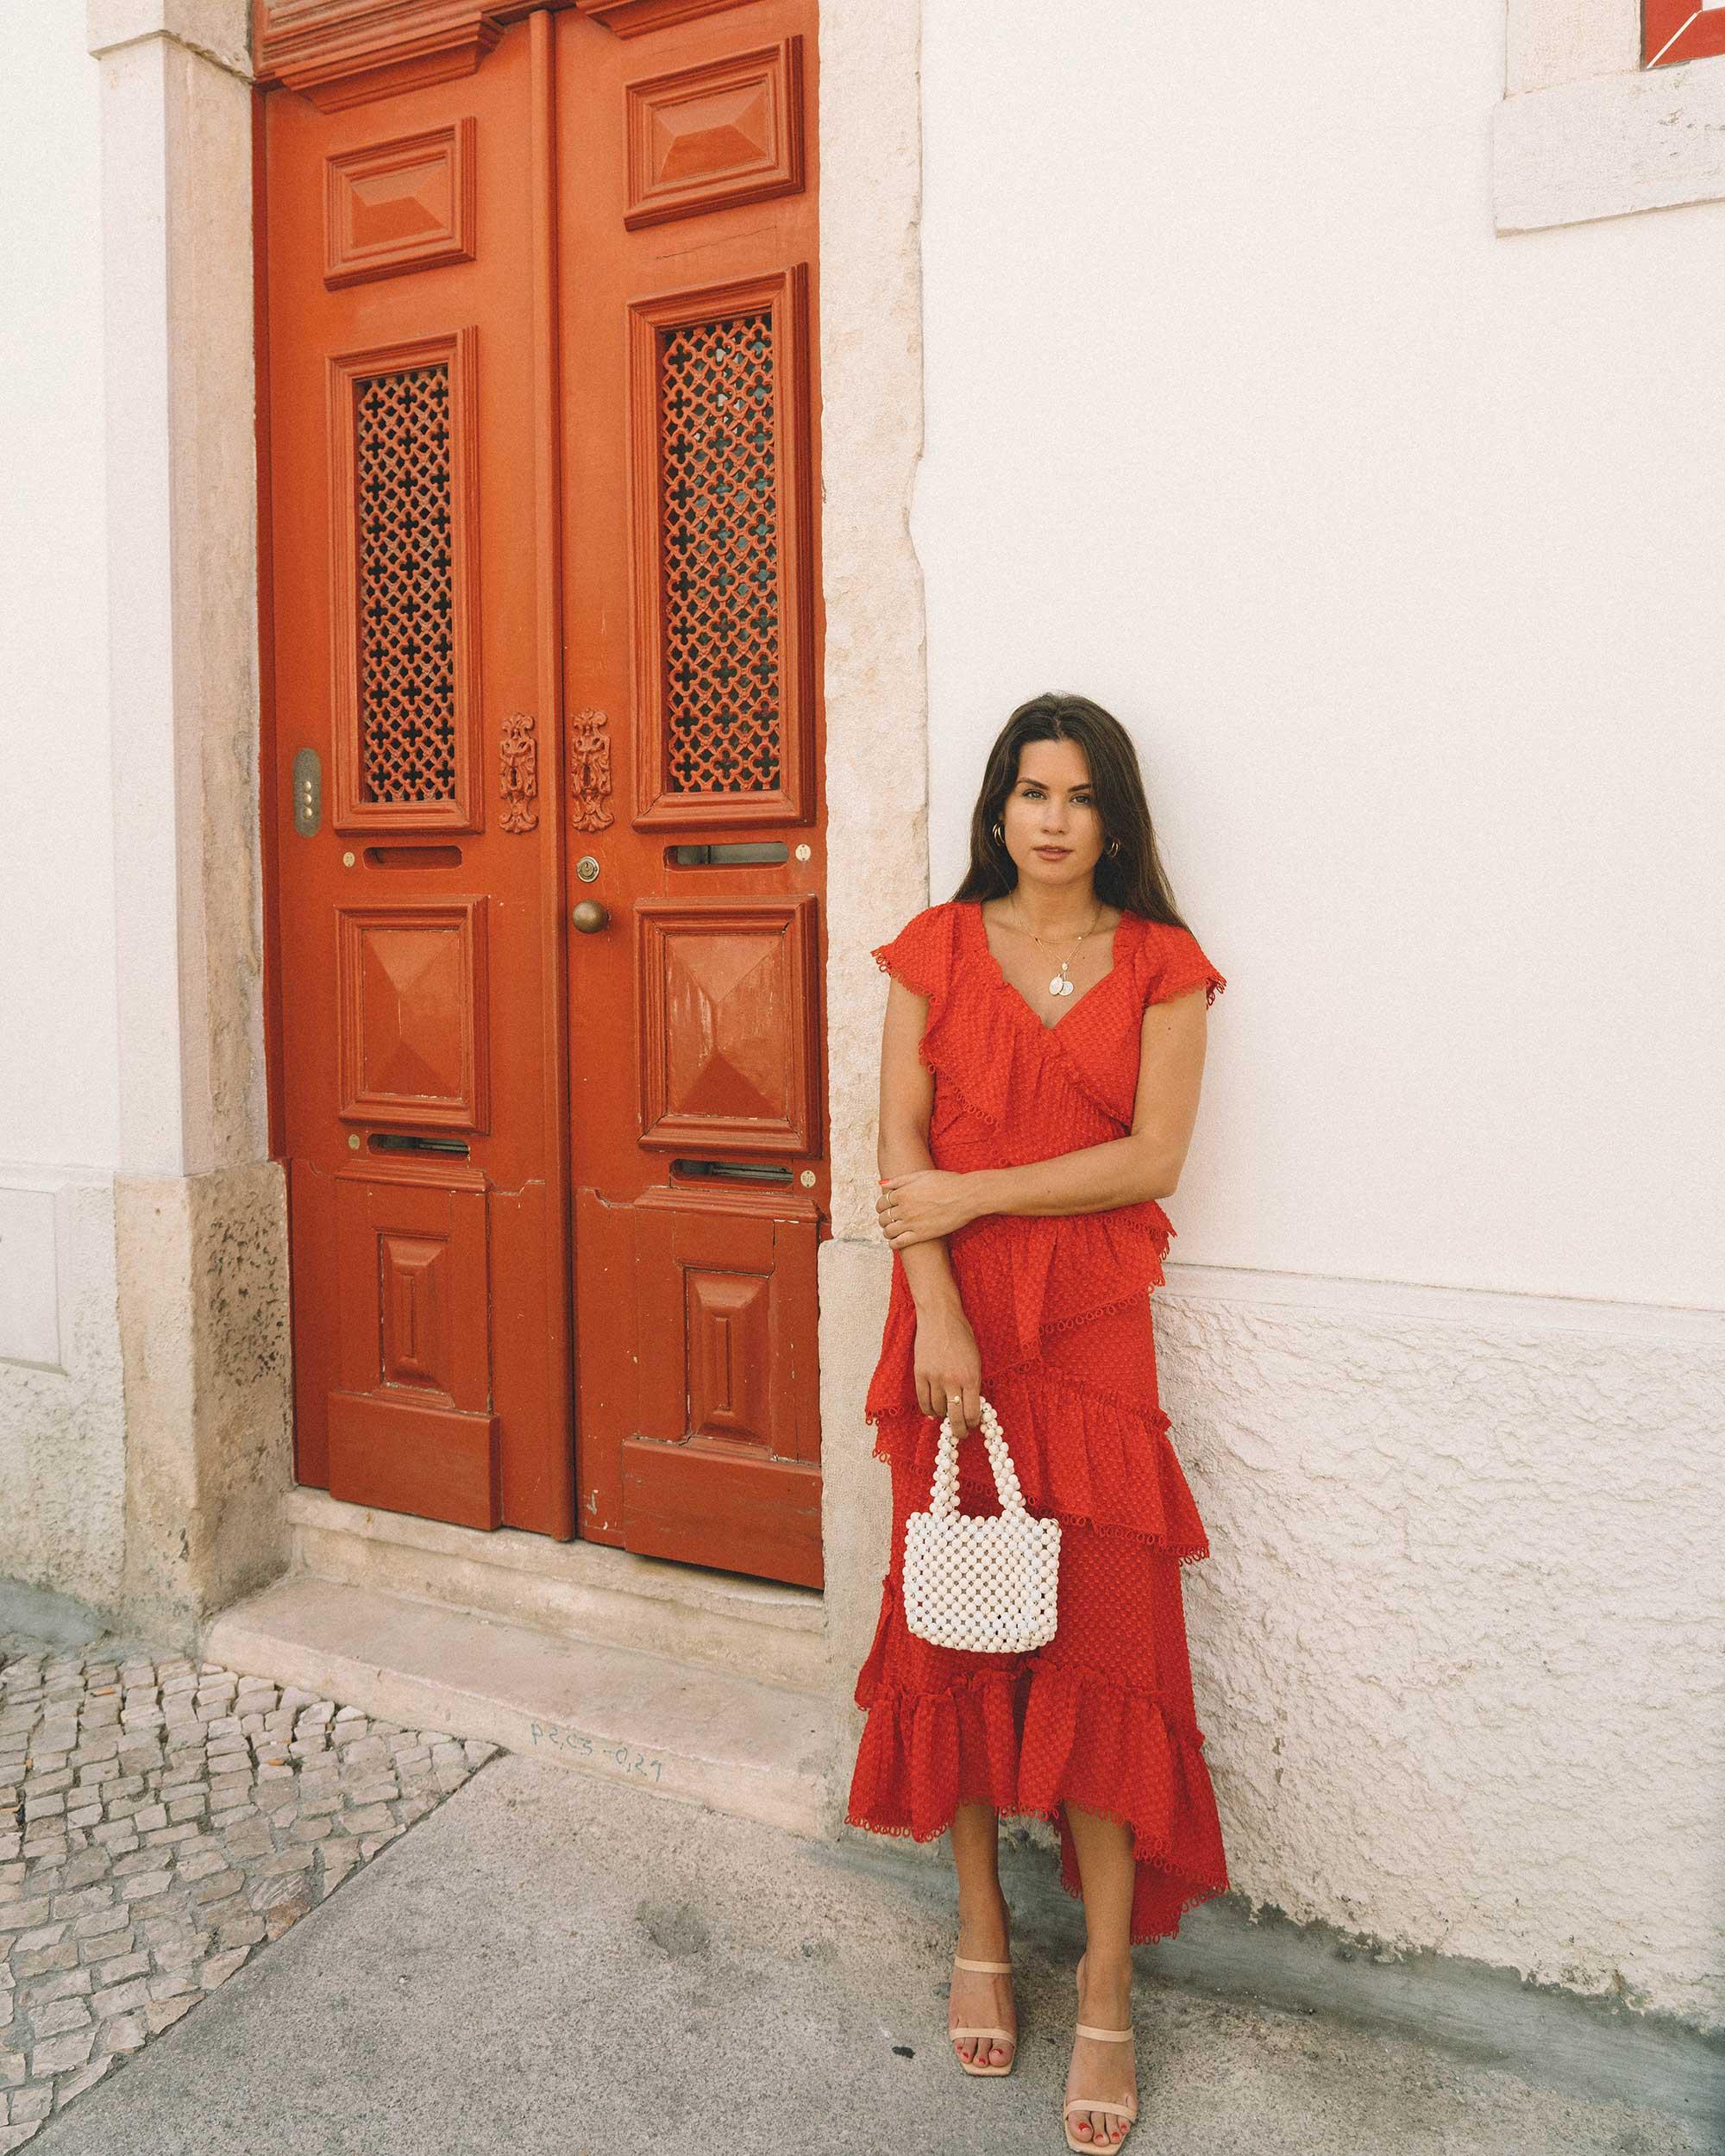 Sarah Butler of Sarah Styles Seattle wears THREE FLOOR Rouge tiered midi dress in Lisbon, Portugal | @sarahchristine 4.jpg